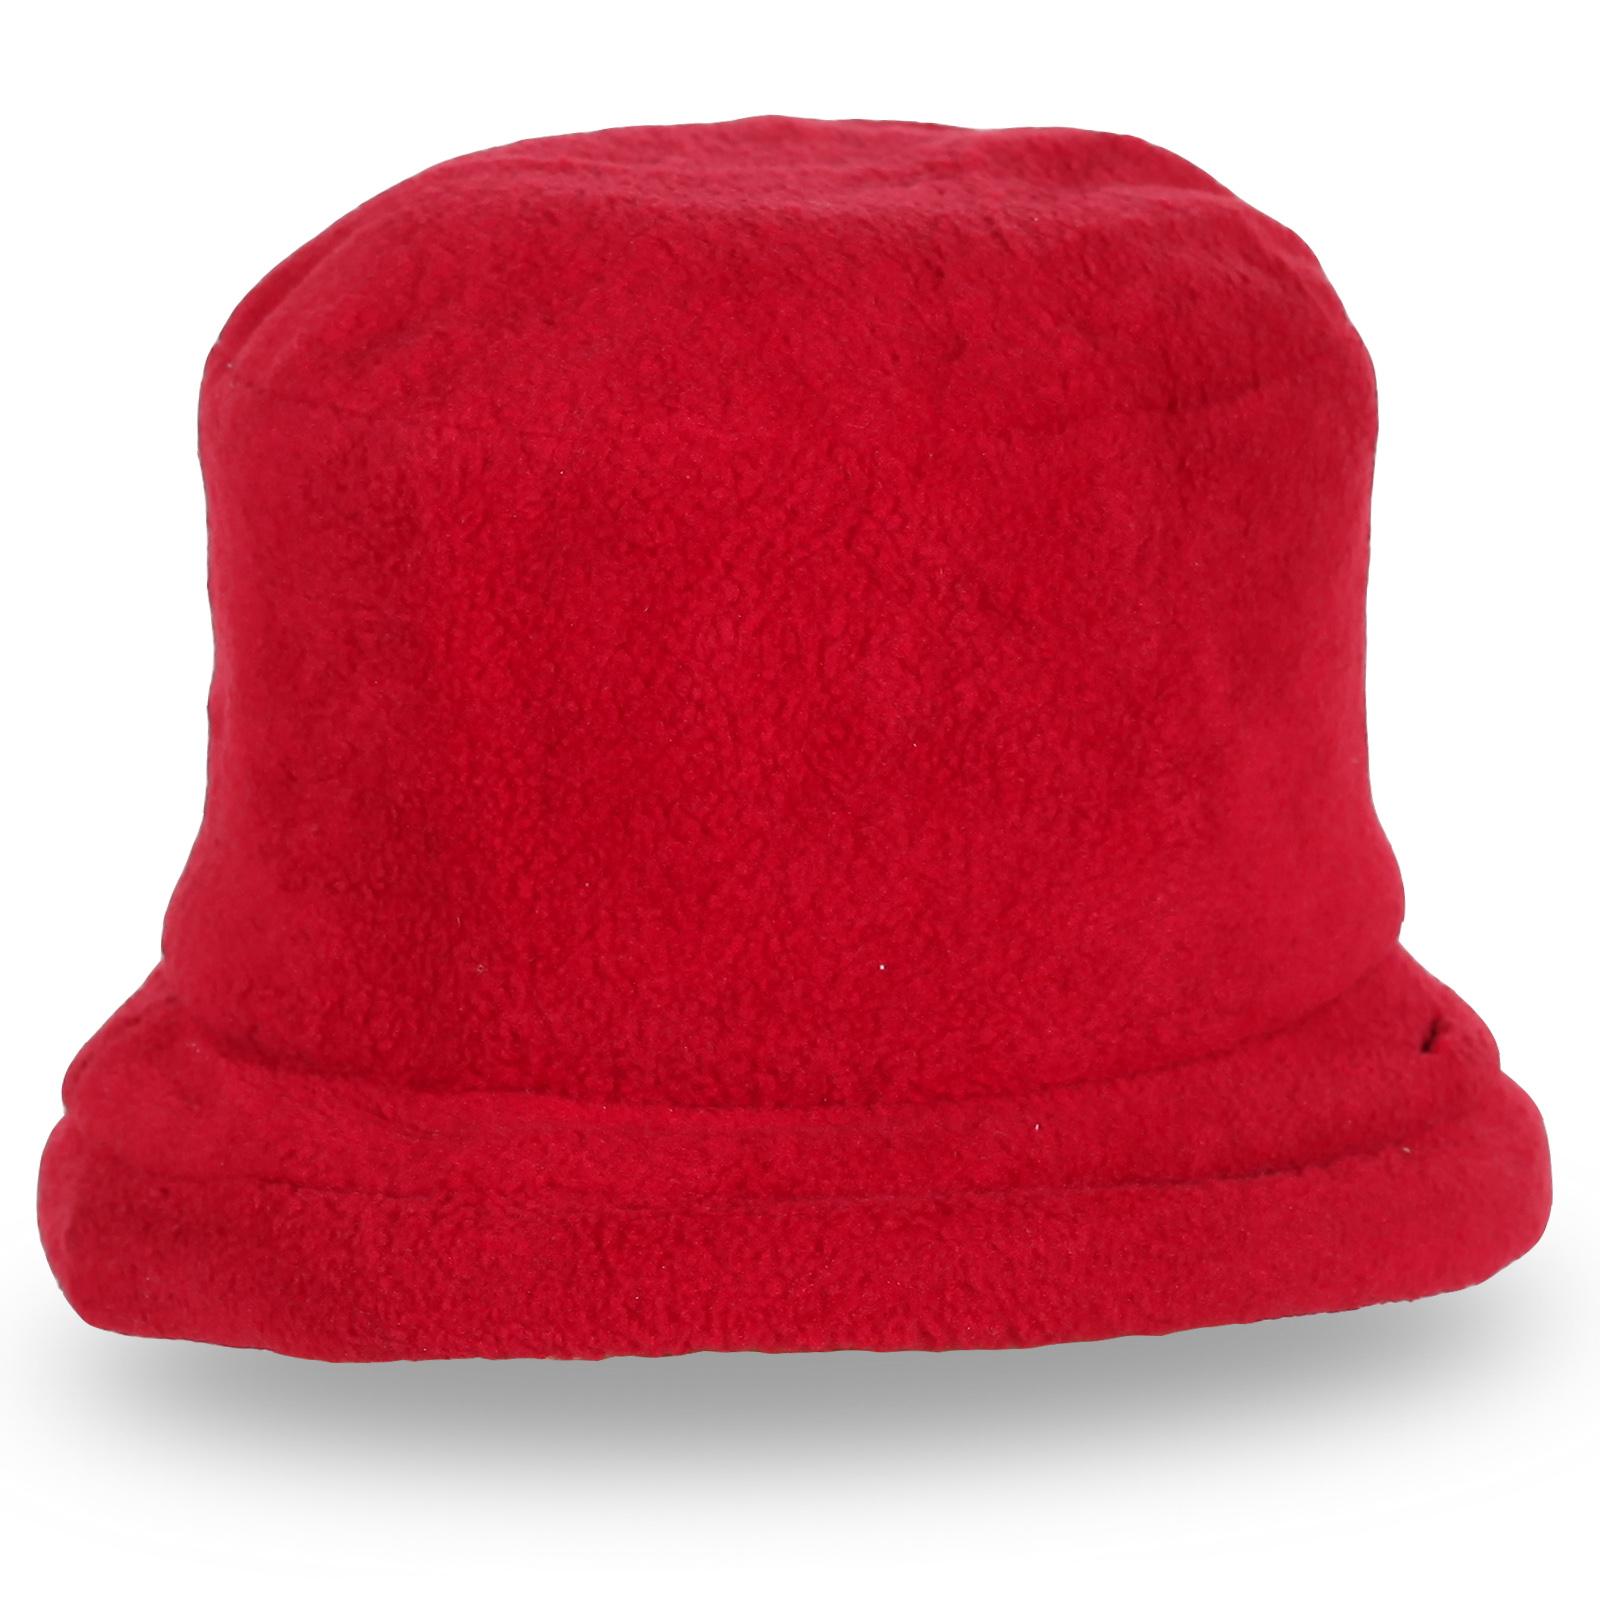 Стильная красная шляпа для модниц